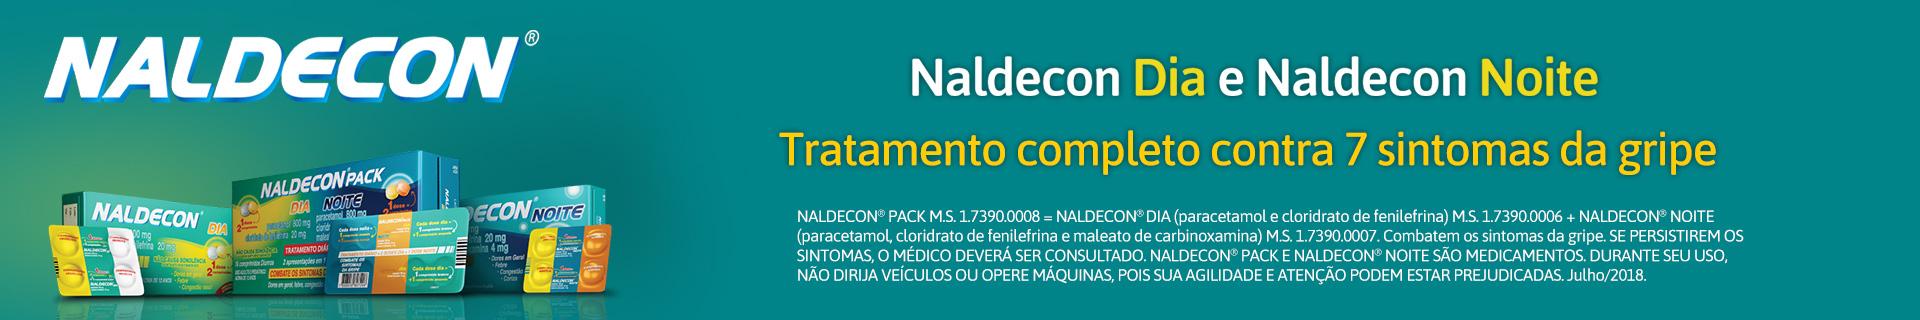 B255997a1896aa93f8340a0e2e0c645497ccd7e5naldecon 3 1920 320 consulta remedios